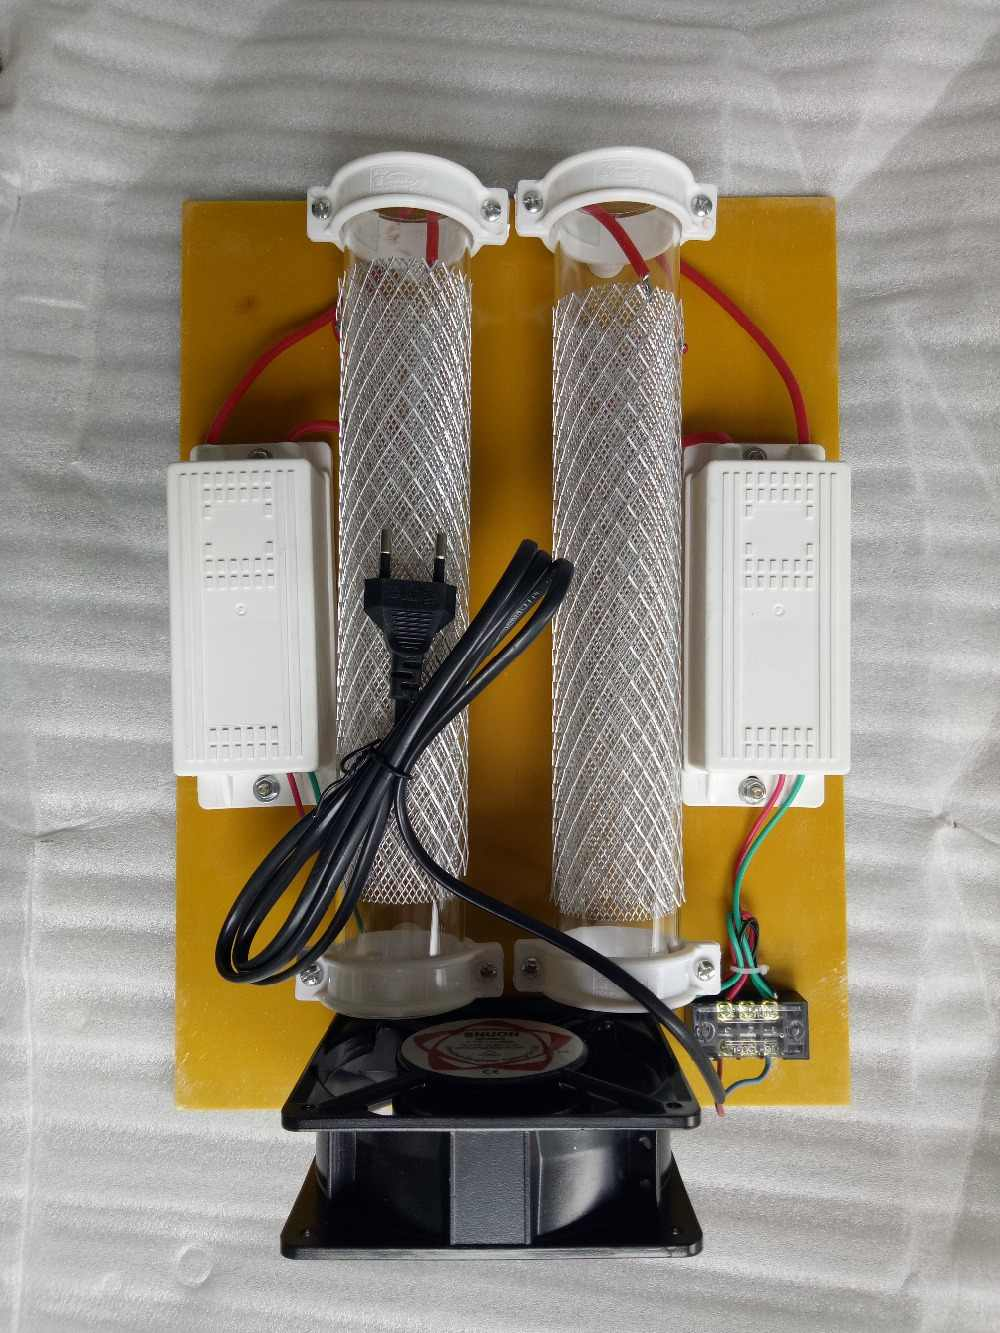 1PC Ozone Generator Accessories 2g 3g 5g 7g Ozone Tube Tubular Ozone Generator